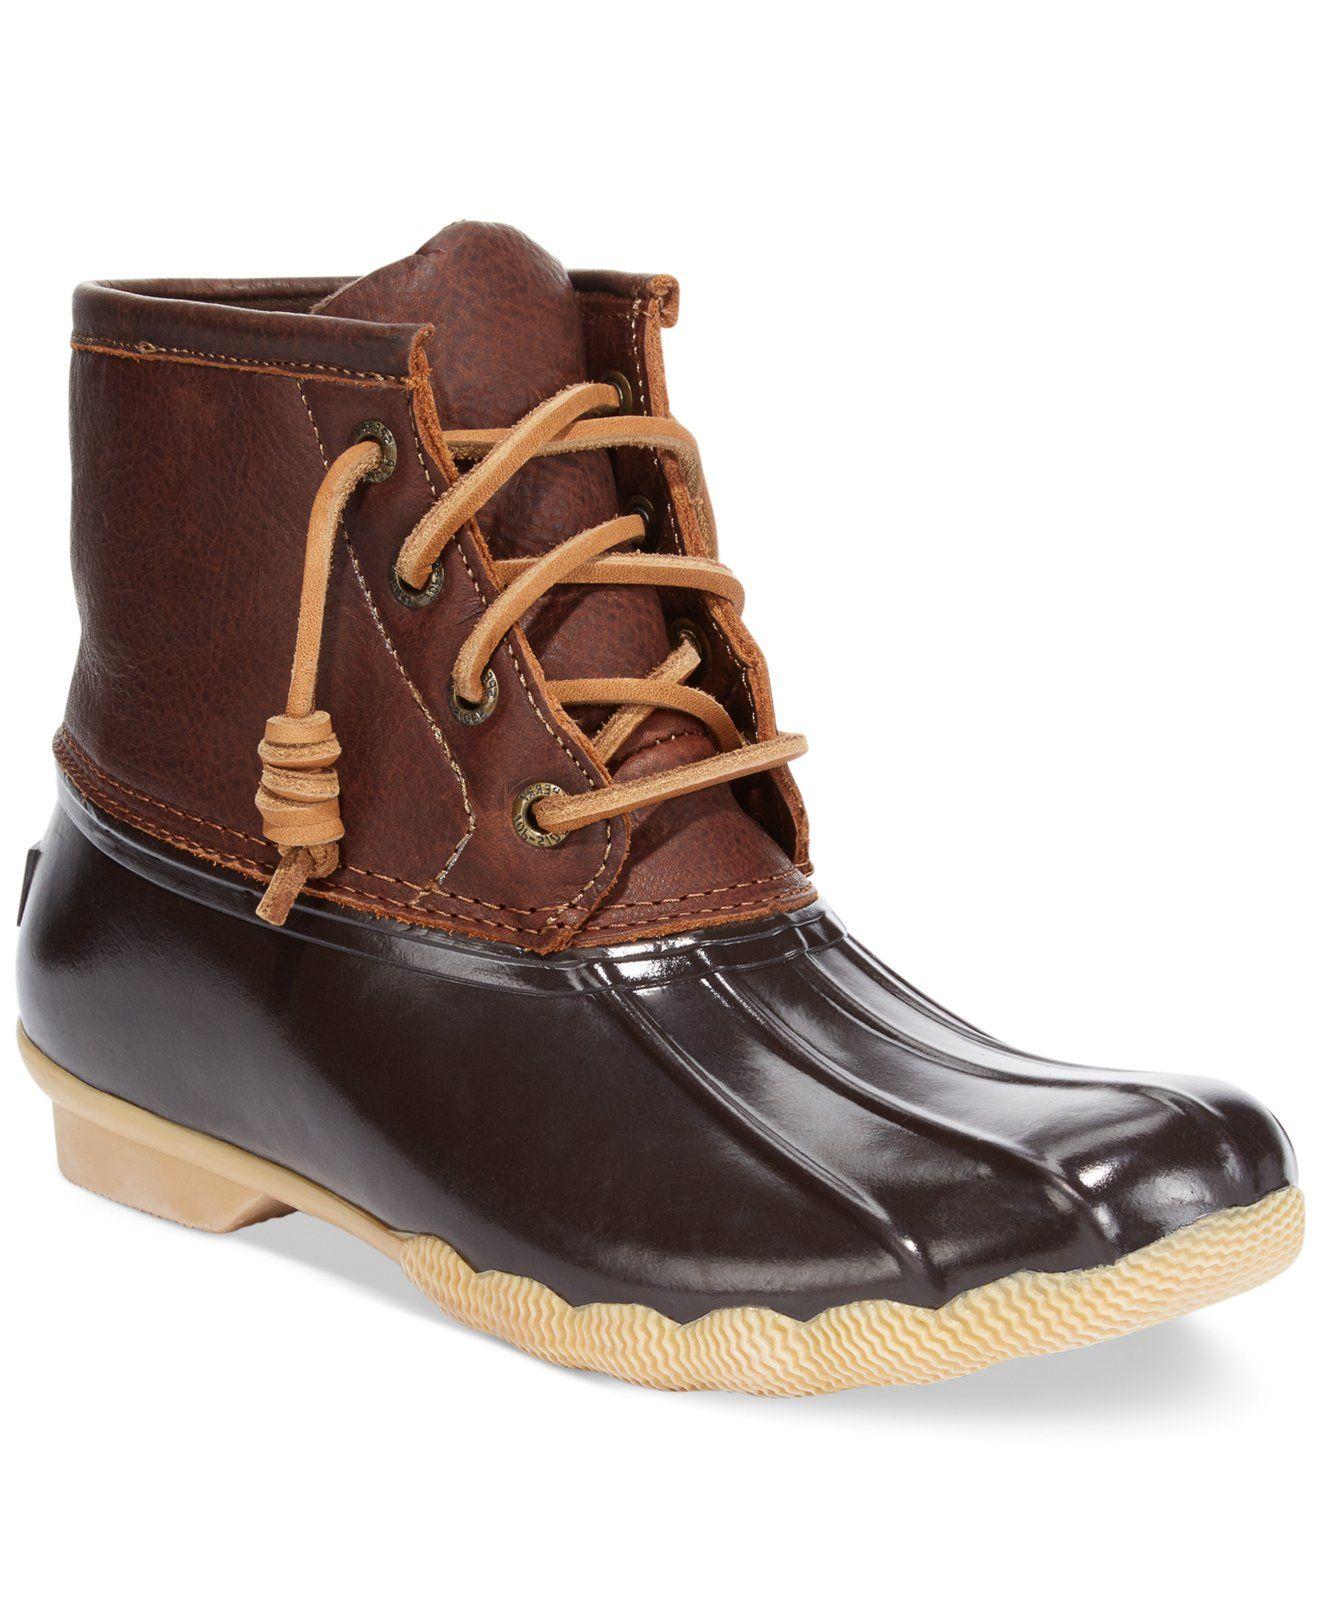 3c1e19f0f837 Sperry Top-Sider Women s Salt Water Duck Booties - Winter   Rain Boots -  Shoes - Macy s